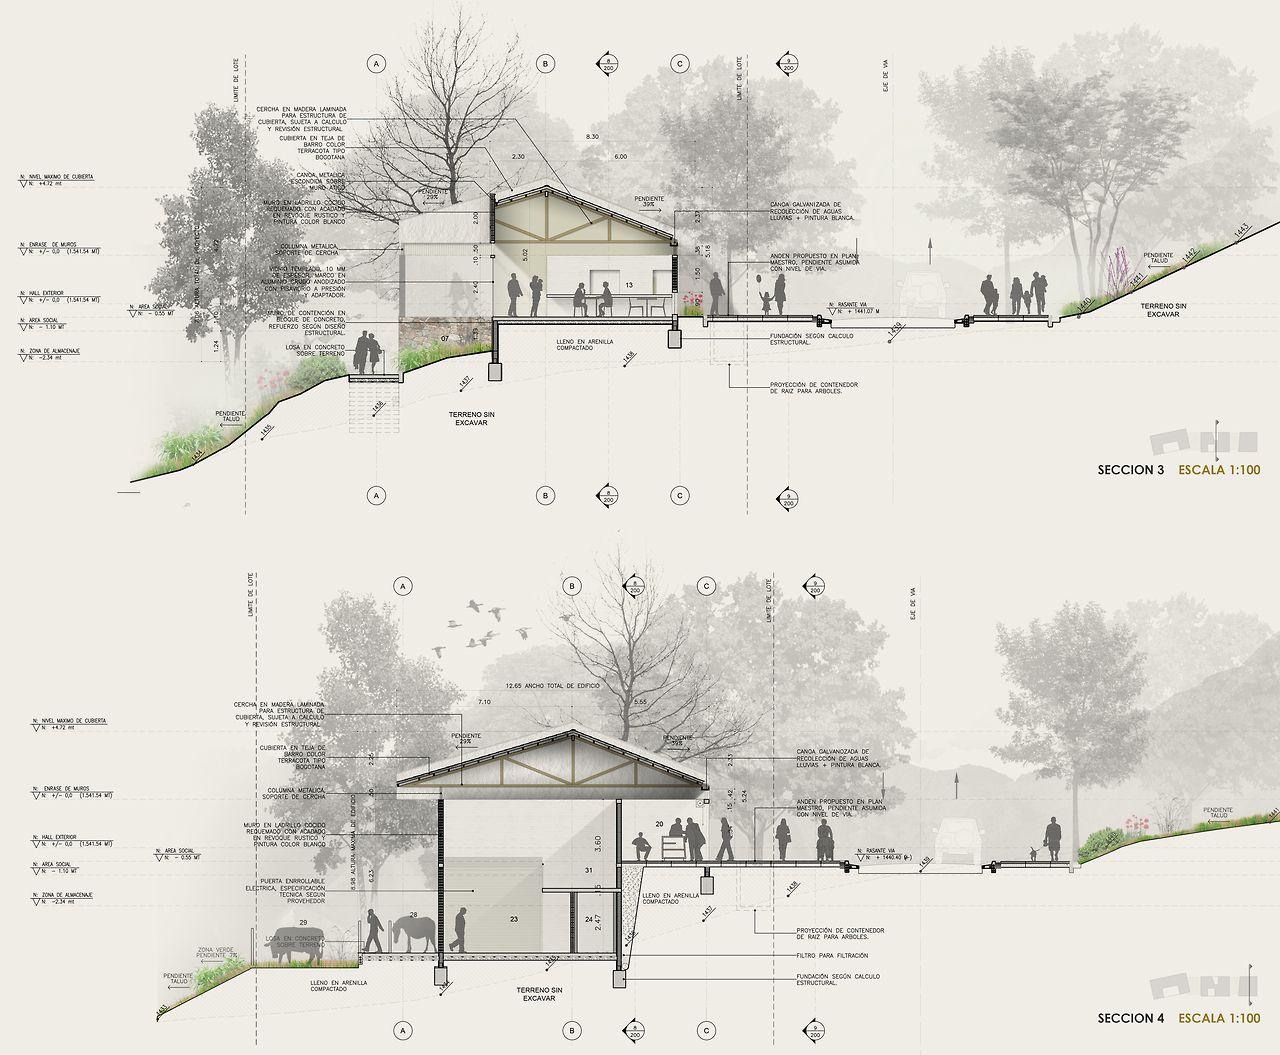 tumblr architecture visualization presentation pinterest architektur. Black Bedroom Furniture Sets. Home Design Ideas